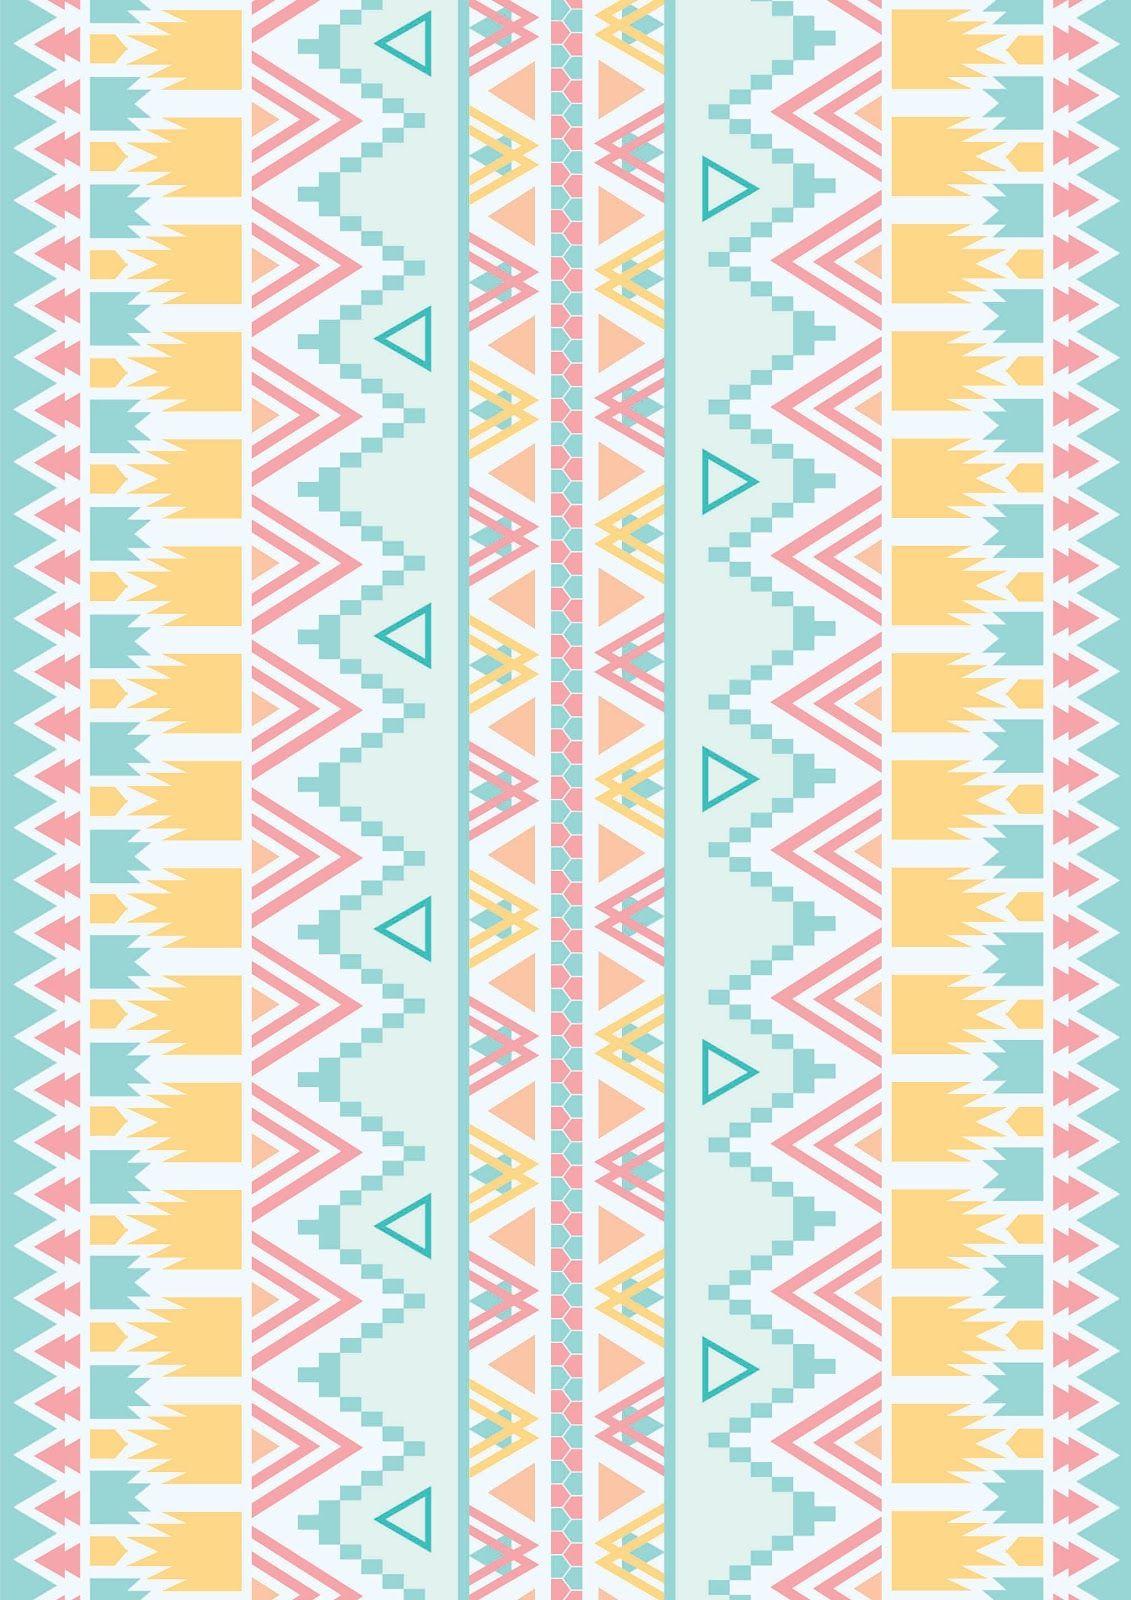 Tumblr Aztec Pattern Backgrounds wwwpixsharkcom 1131x1600